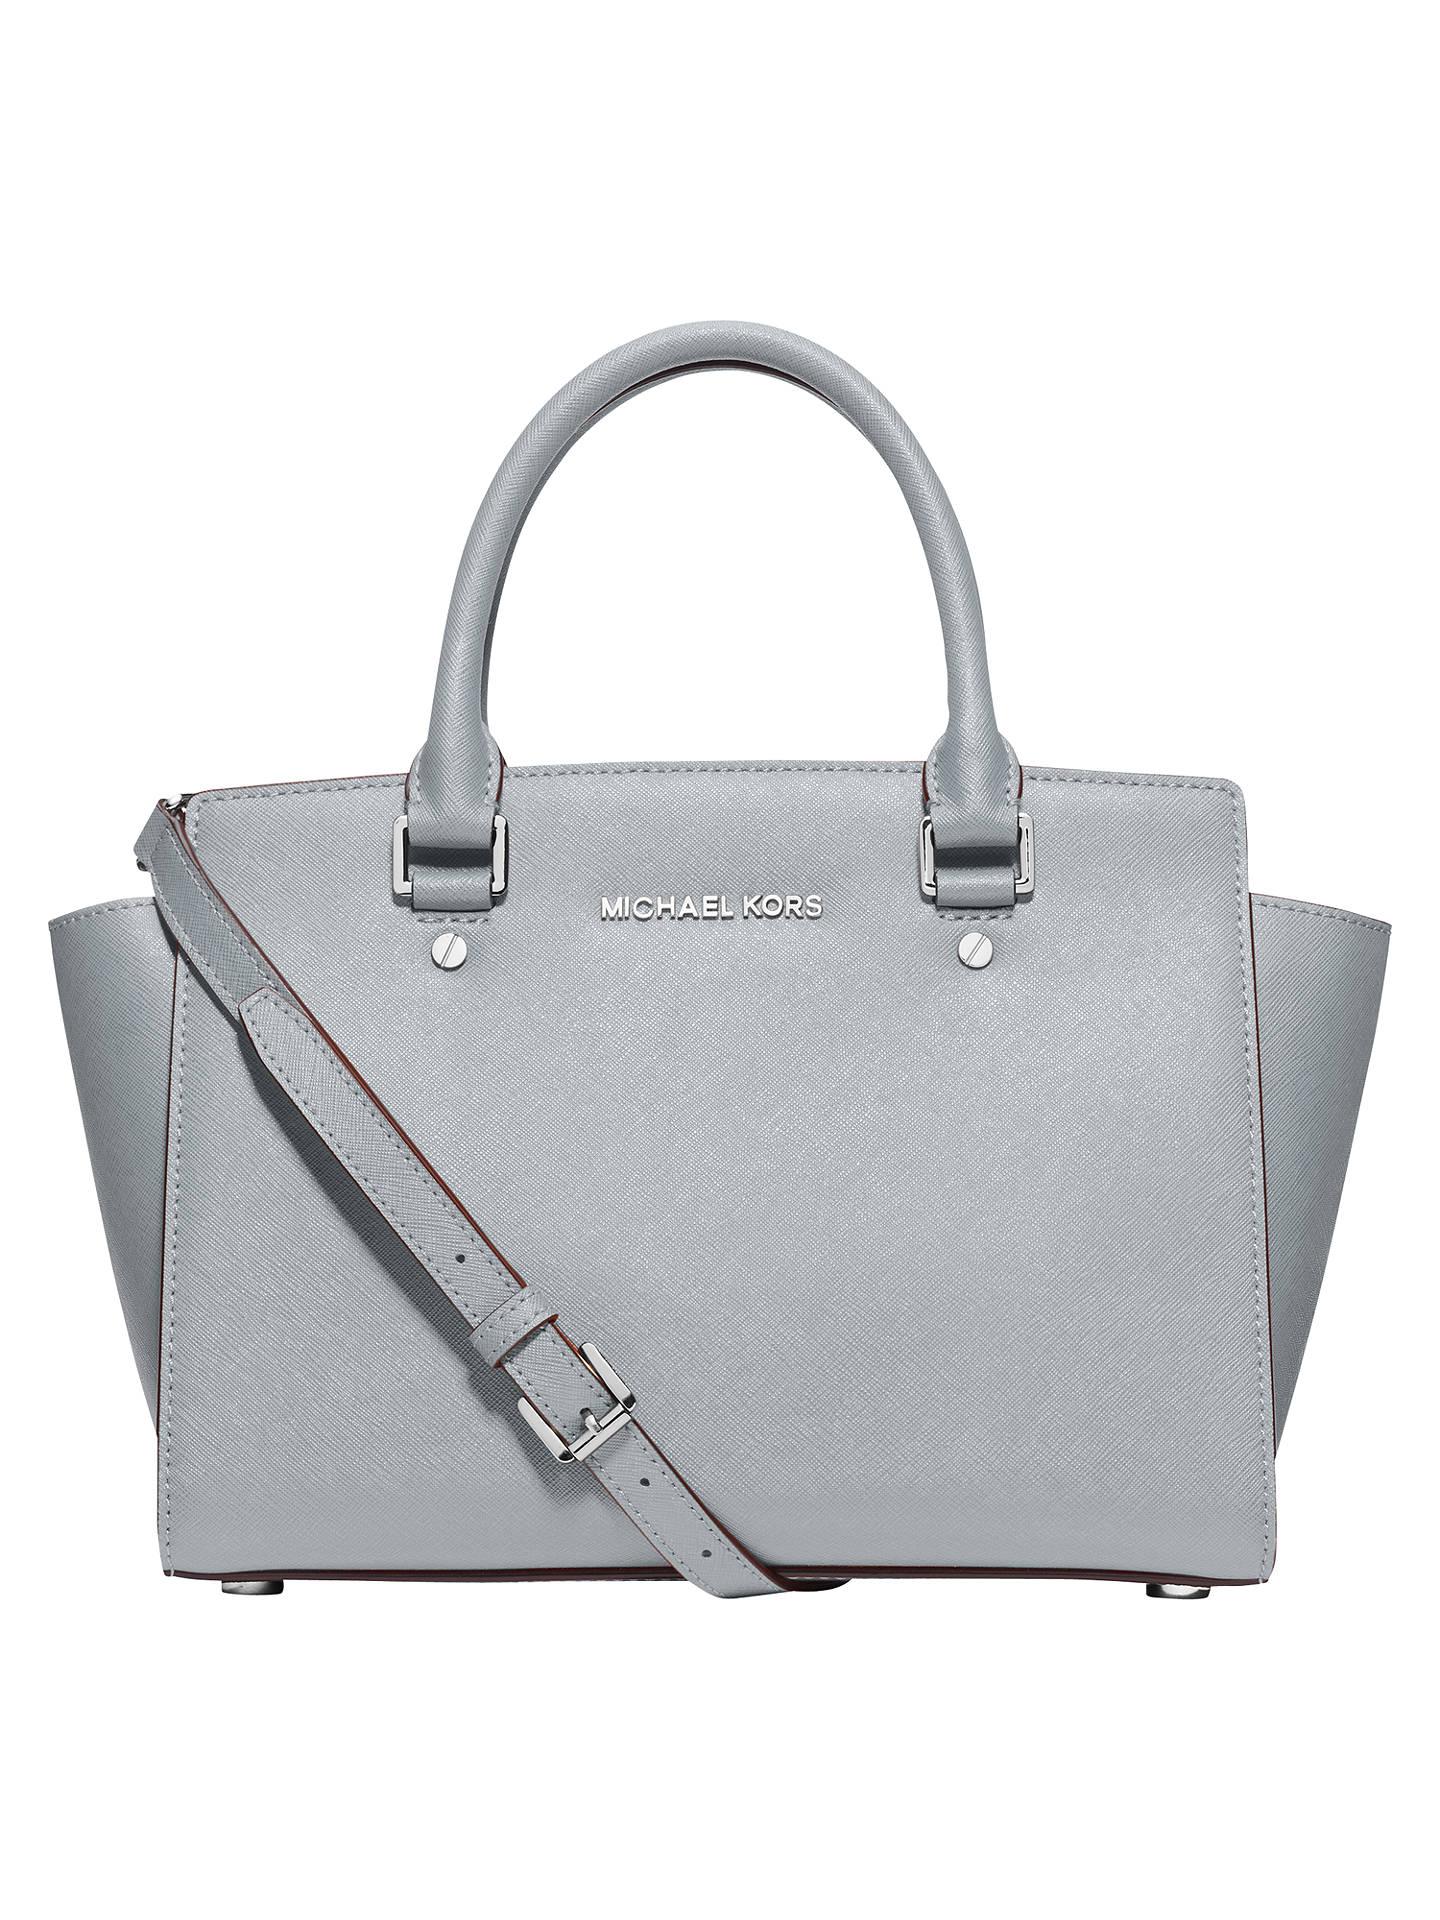 2599e642e86f Buy MICHAEL Michael Kors Selma Leather Medium Satchel, Dusty Blue Online at  johnlewis.com ...